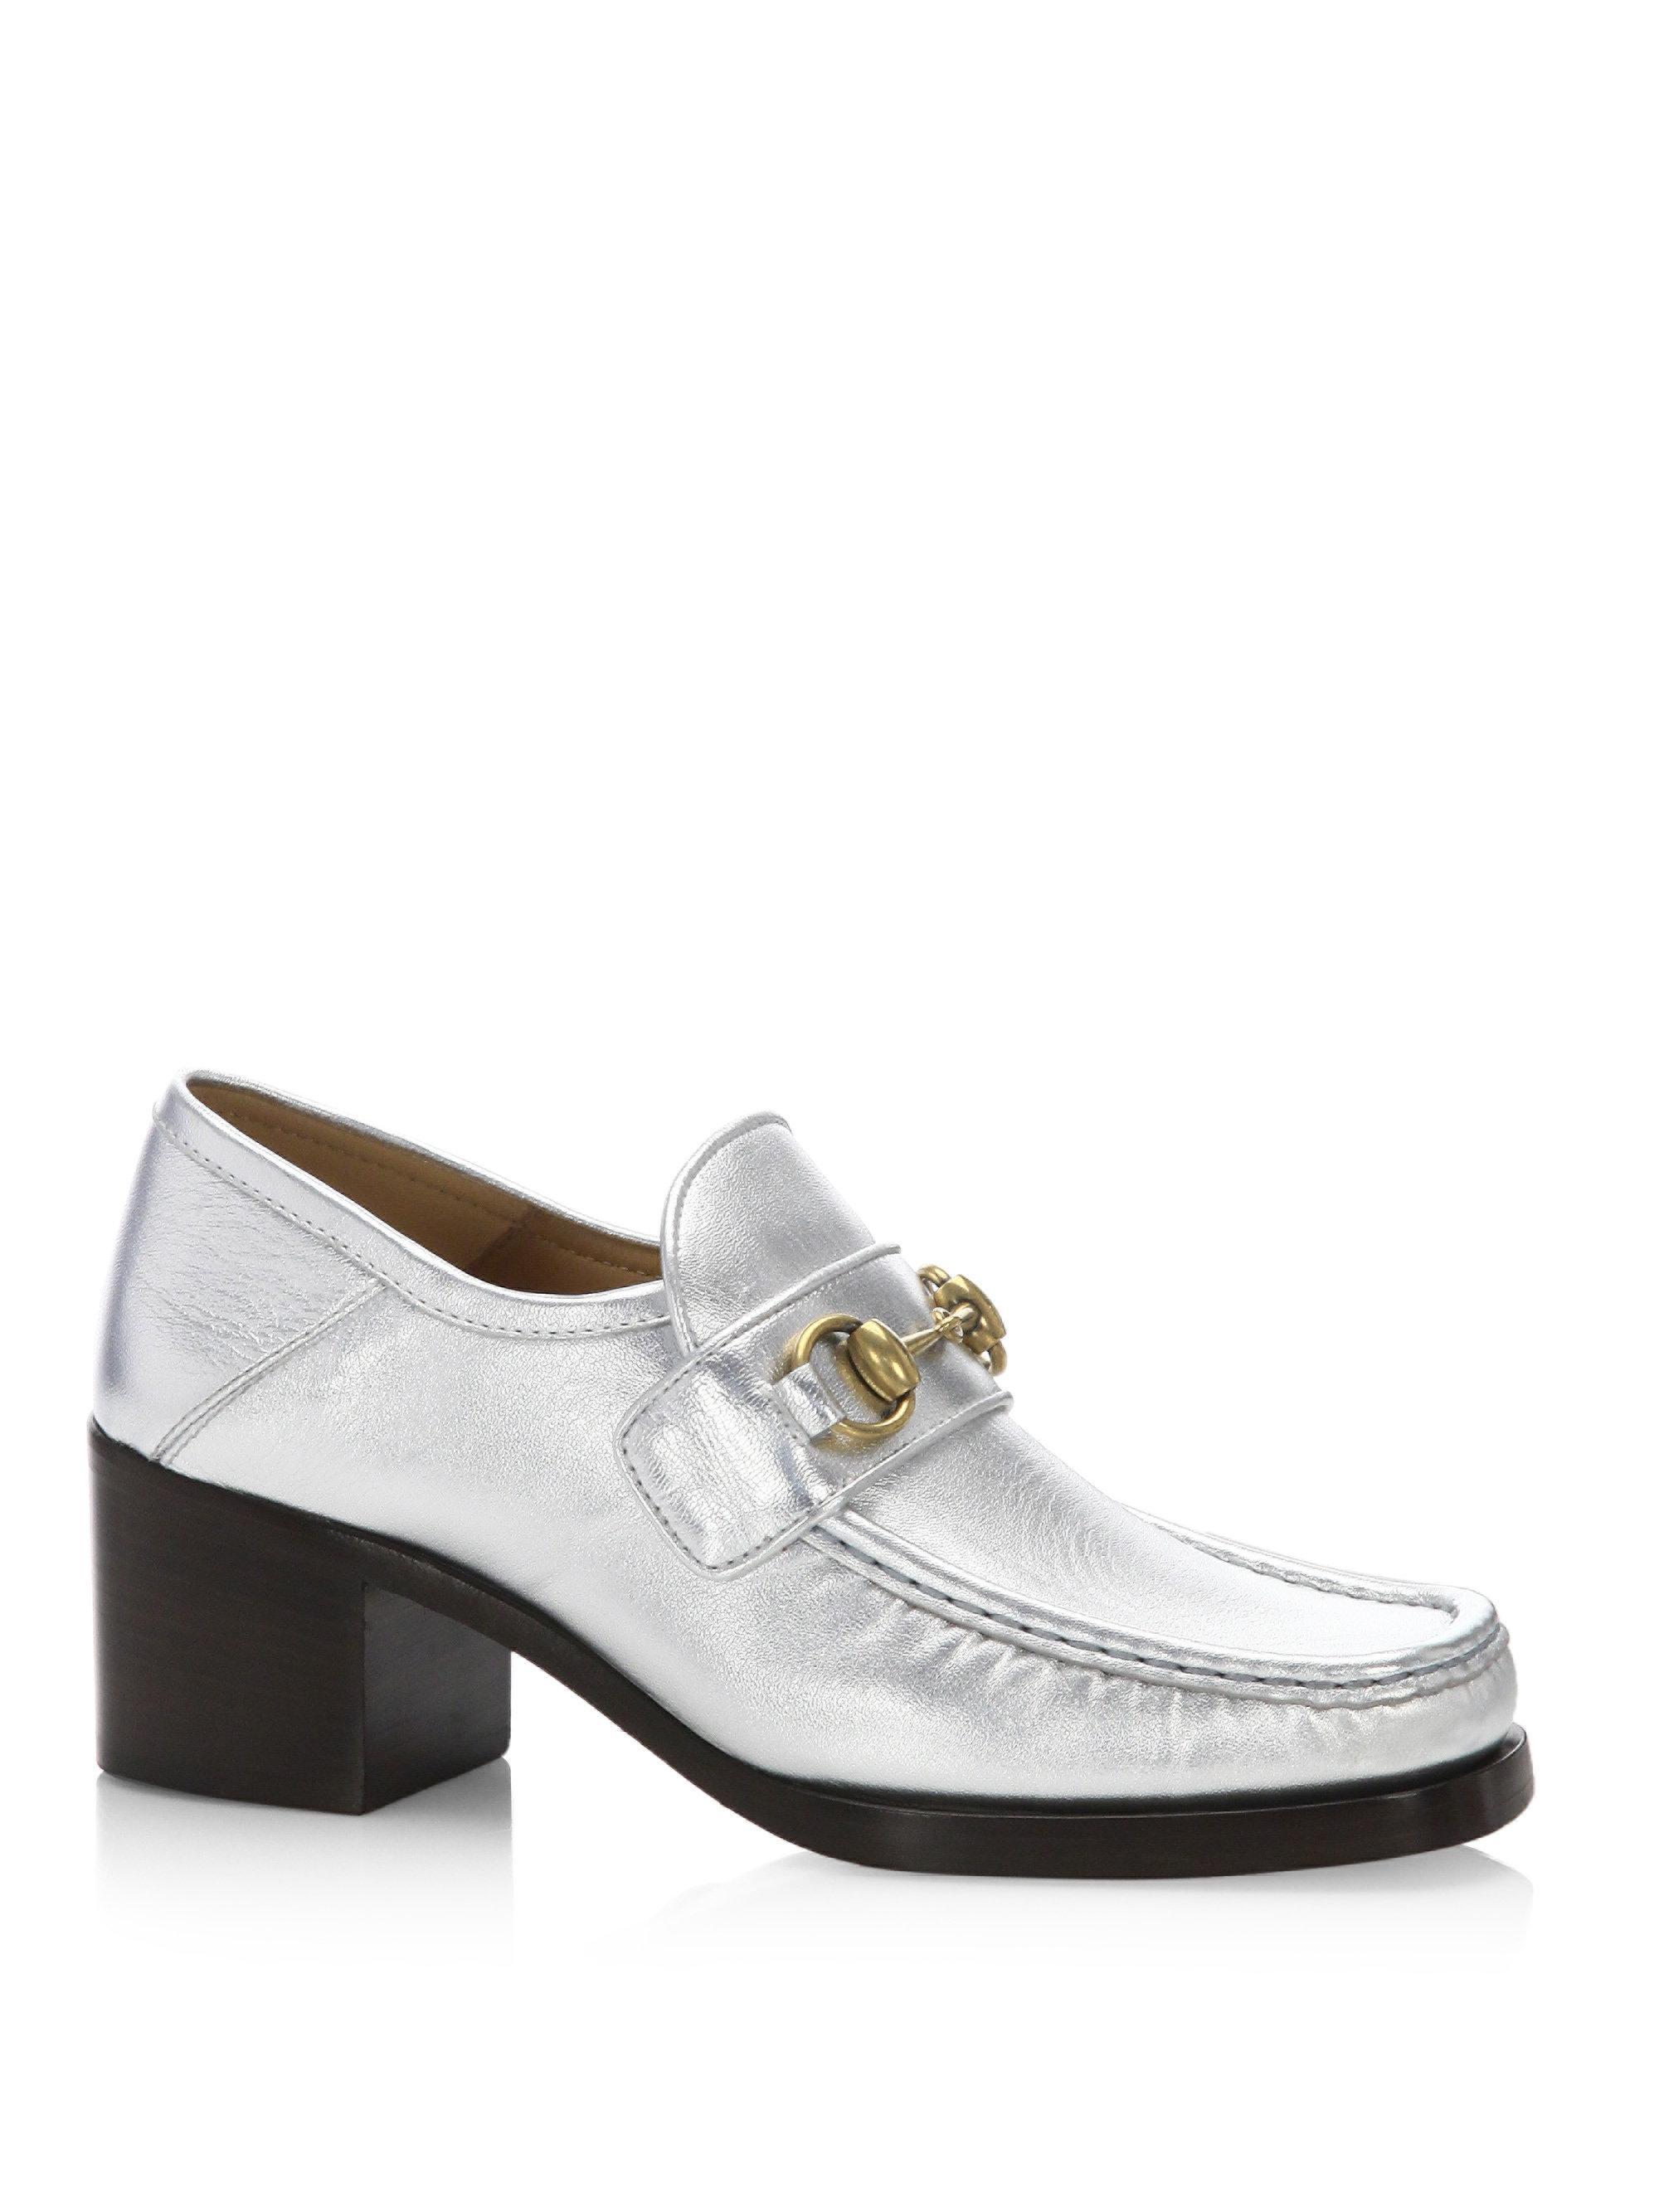 GmwIxLzZxu Vegas Metallic Leather Loafer Loafers